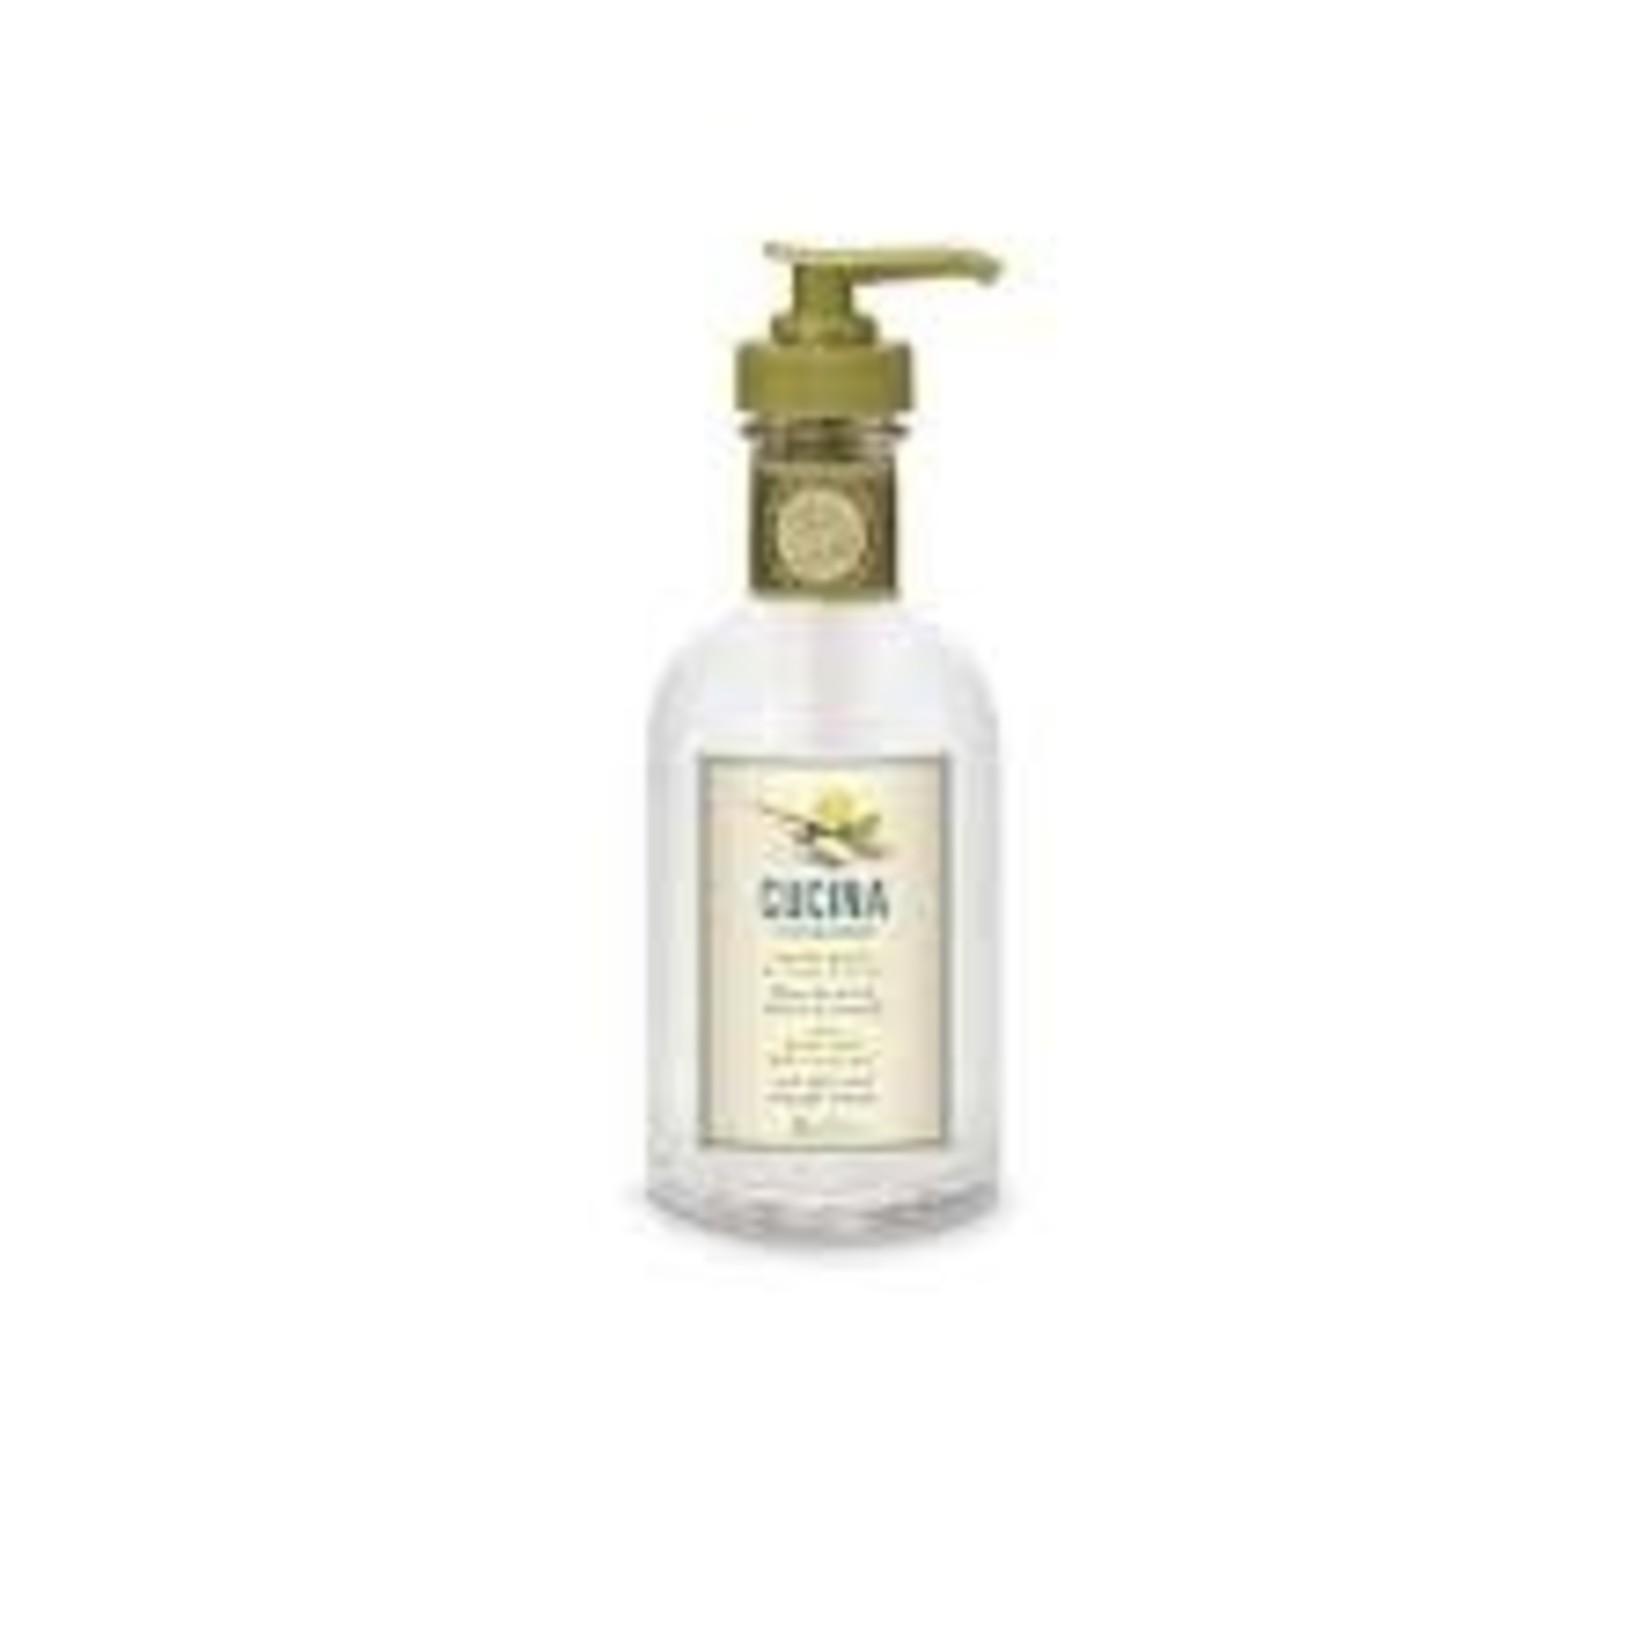 Fruits & Passion Hand Soap 200ml, Sea Salt and Amalfi Lemon